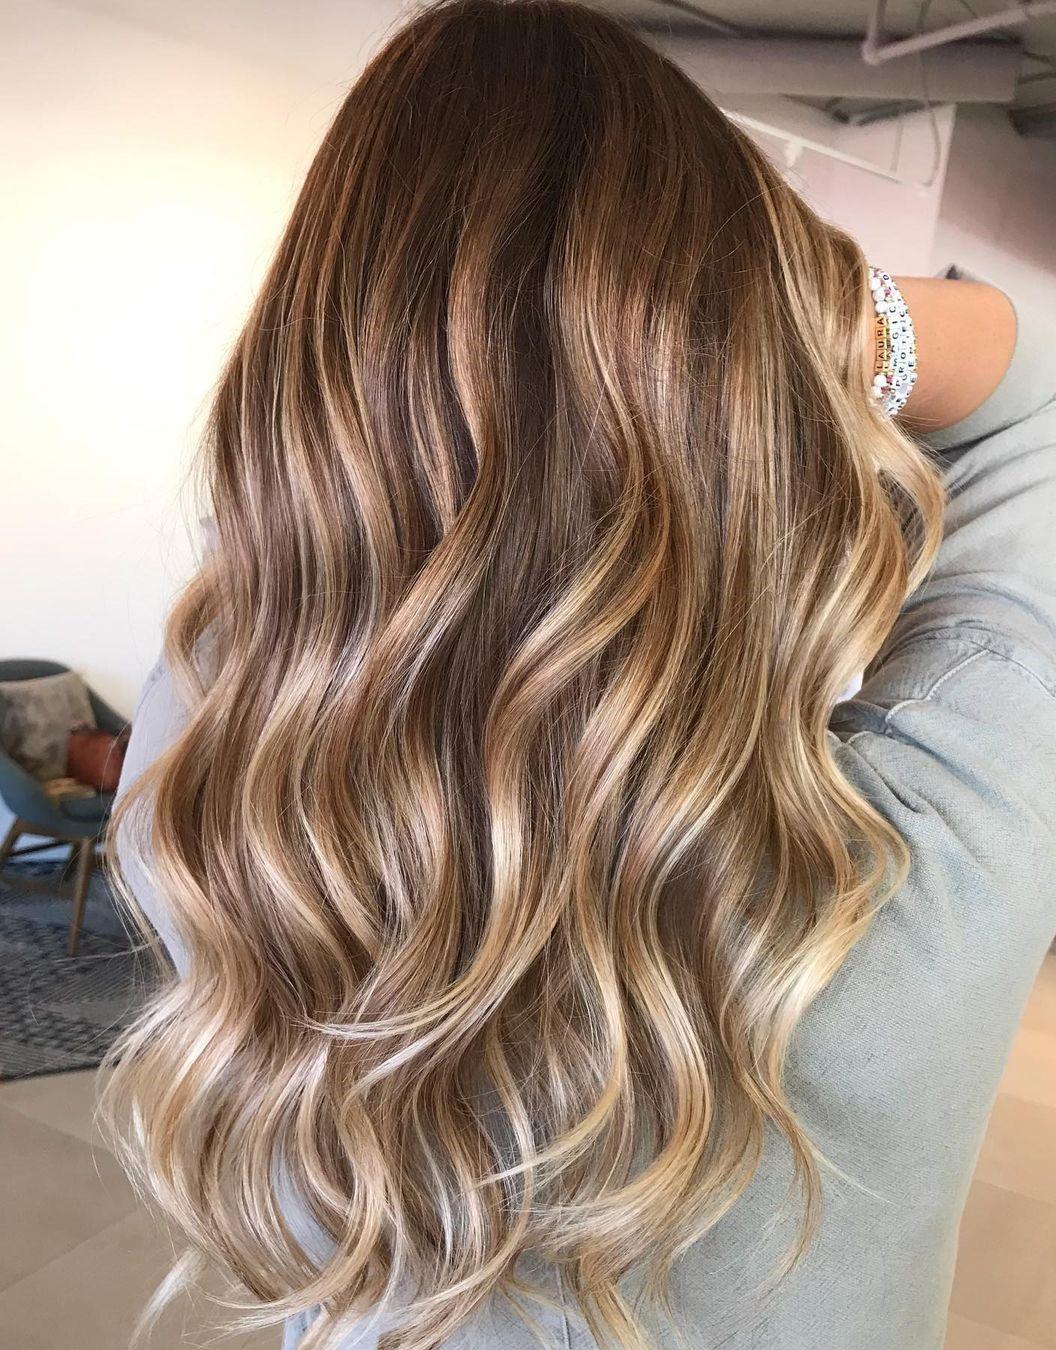 Romantic Dark Hair with Caramel Balayage